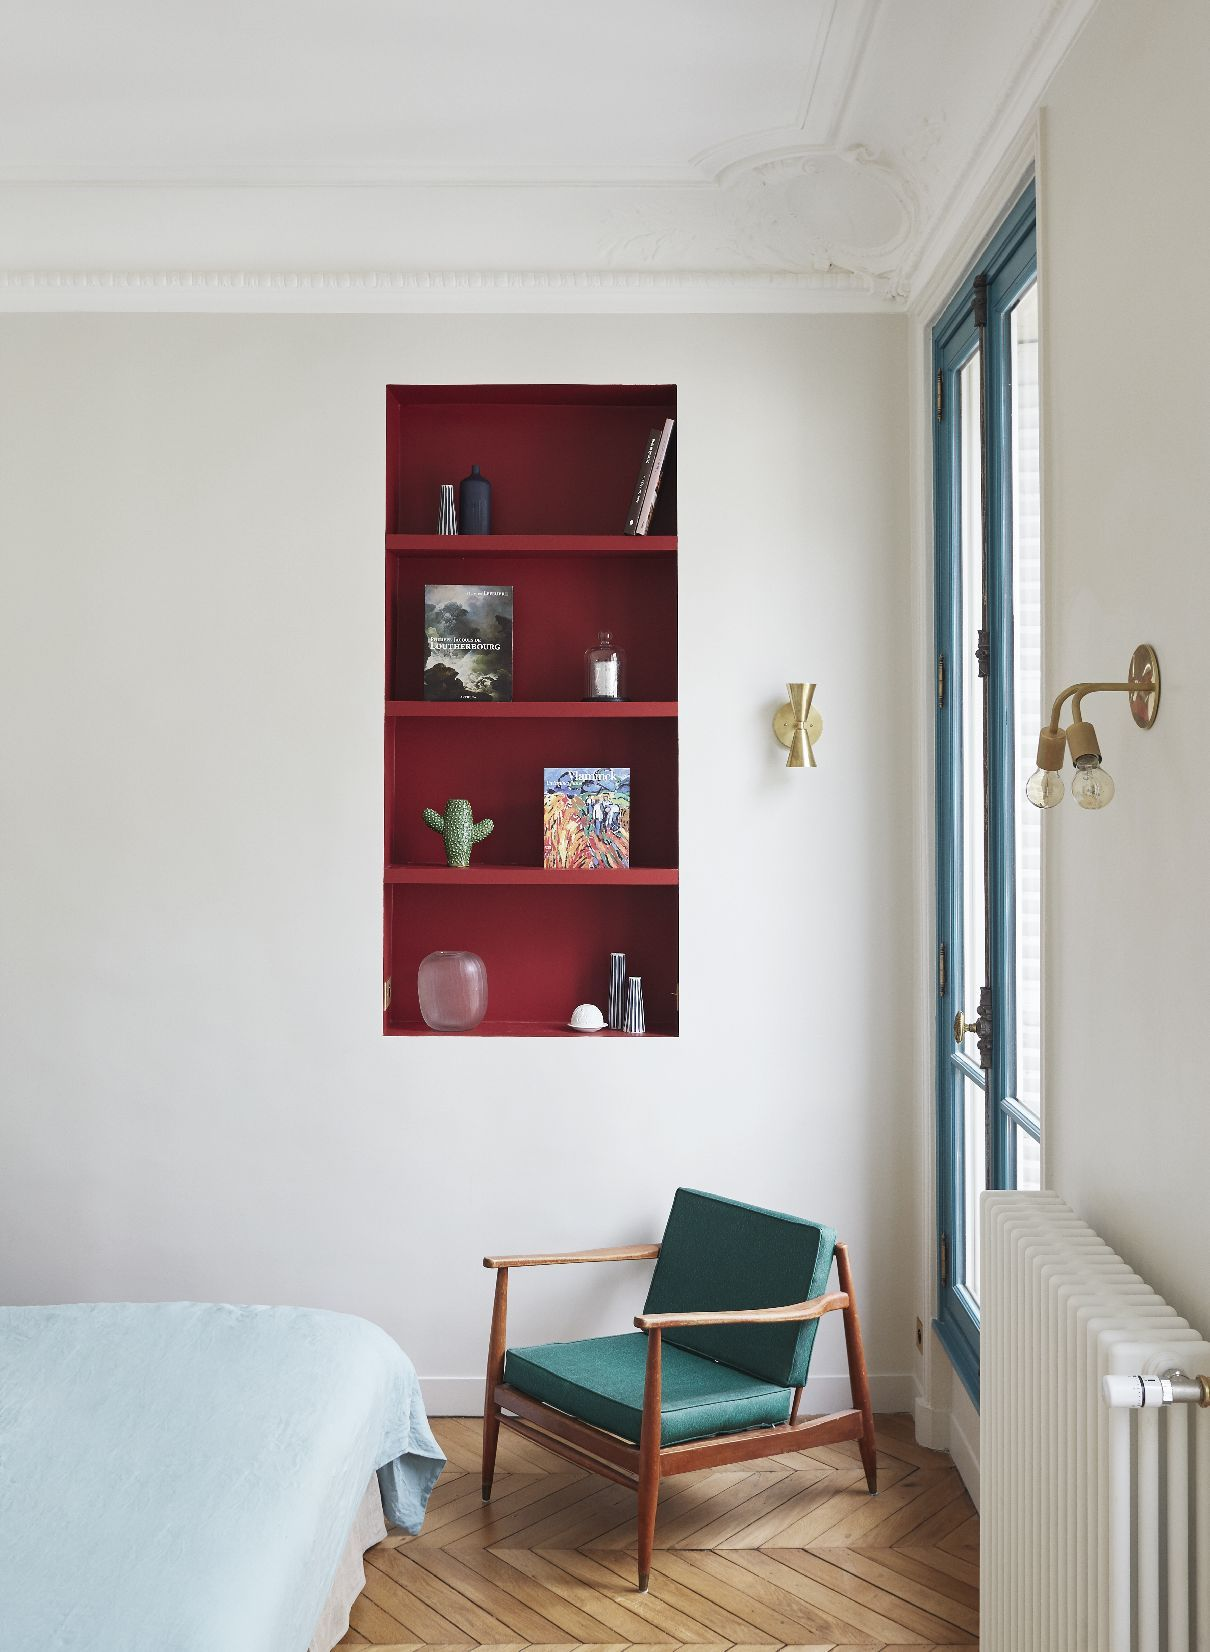 etoile gcg architectes colors pinterest bedrooms salons and interiors. Black Bedroom Furniture Sets. Home Design Ideas